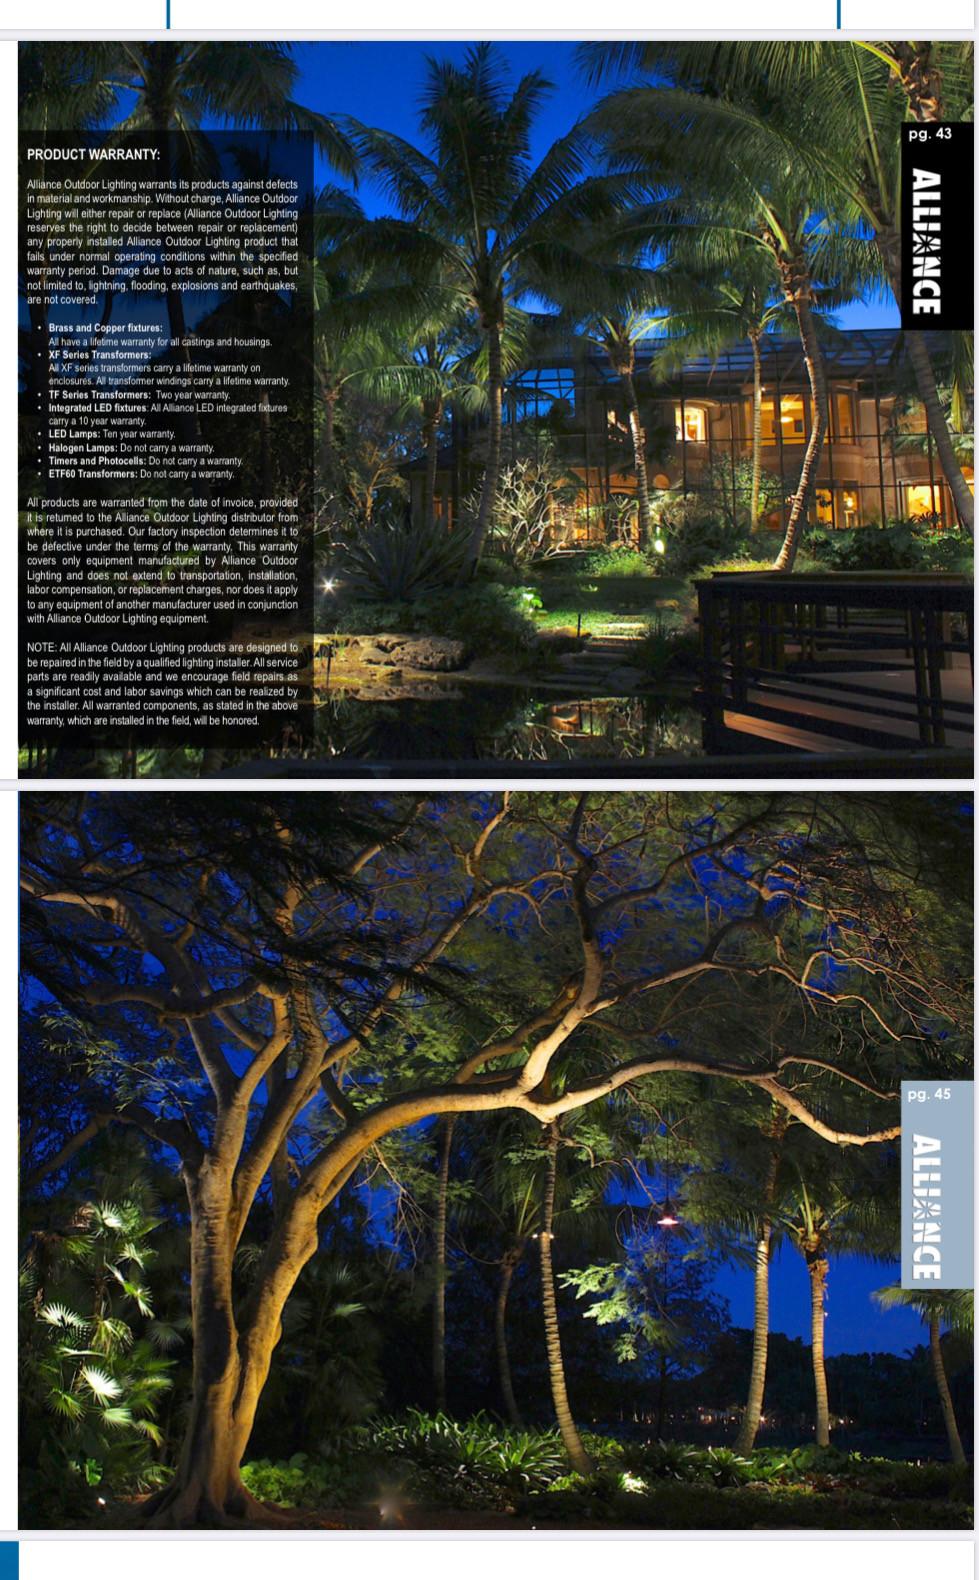 magazine press alliance outdoor lighting